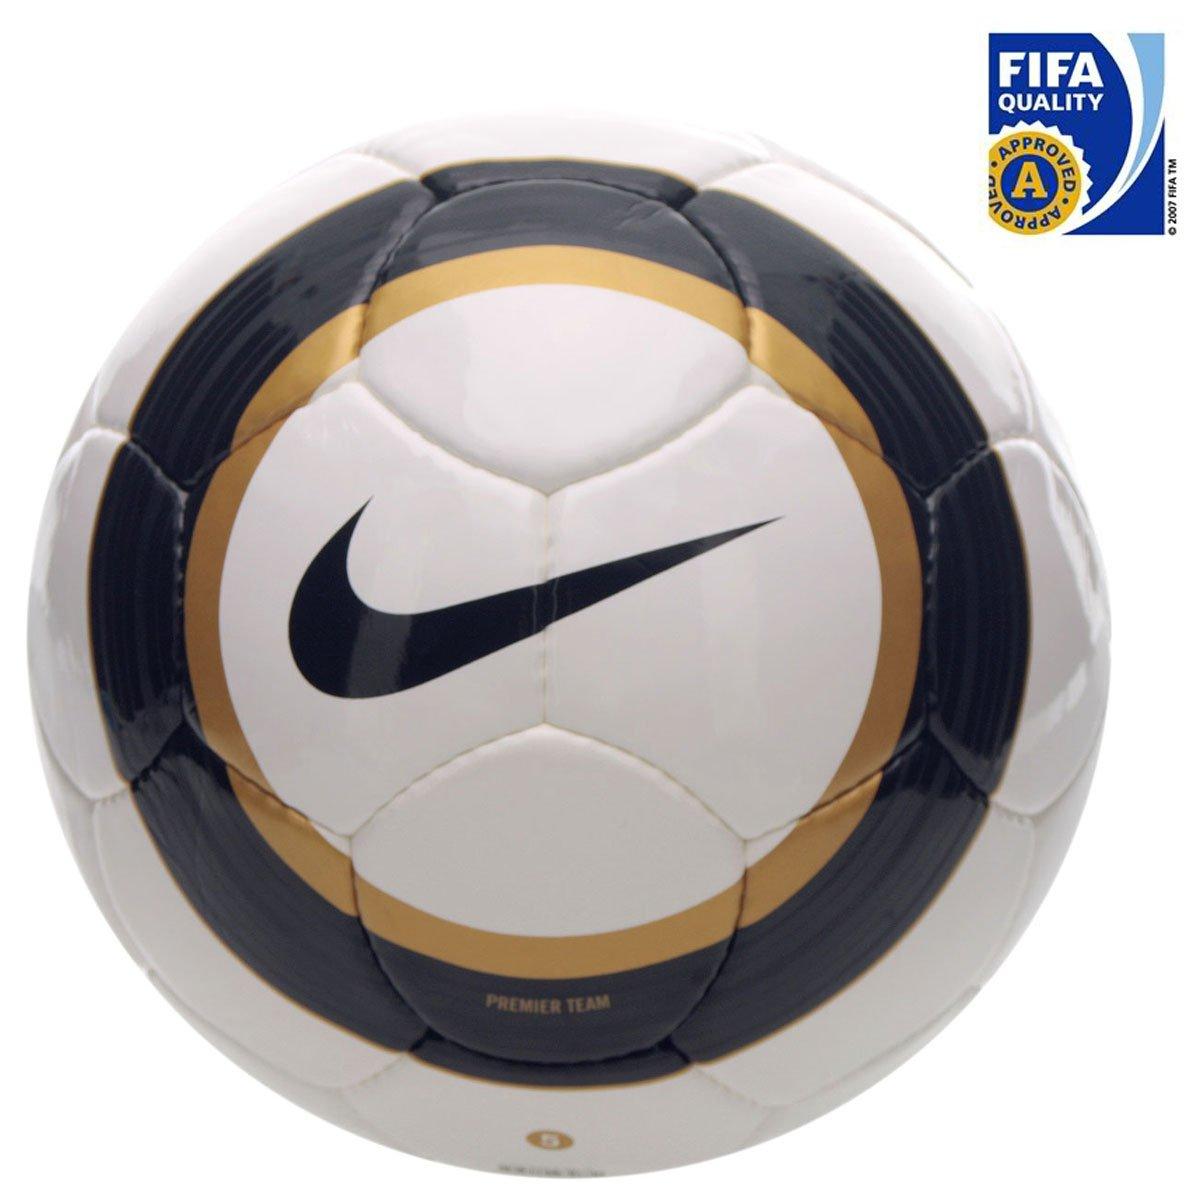 Bola Futebol Nike Premier Team FIFA Campo - Compre Agora  06f7edaa82e3e